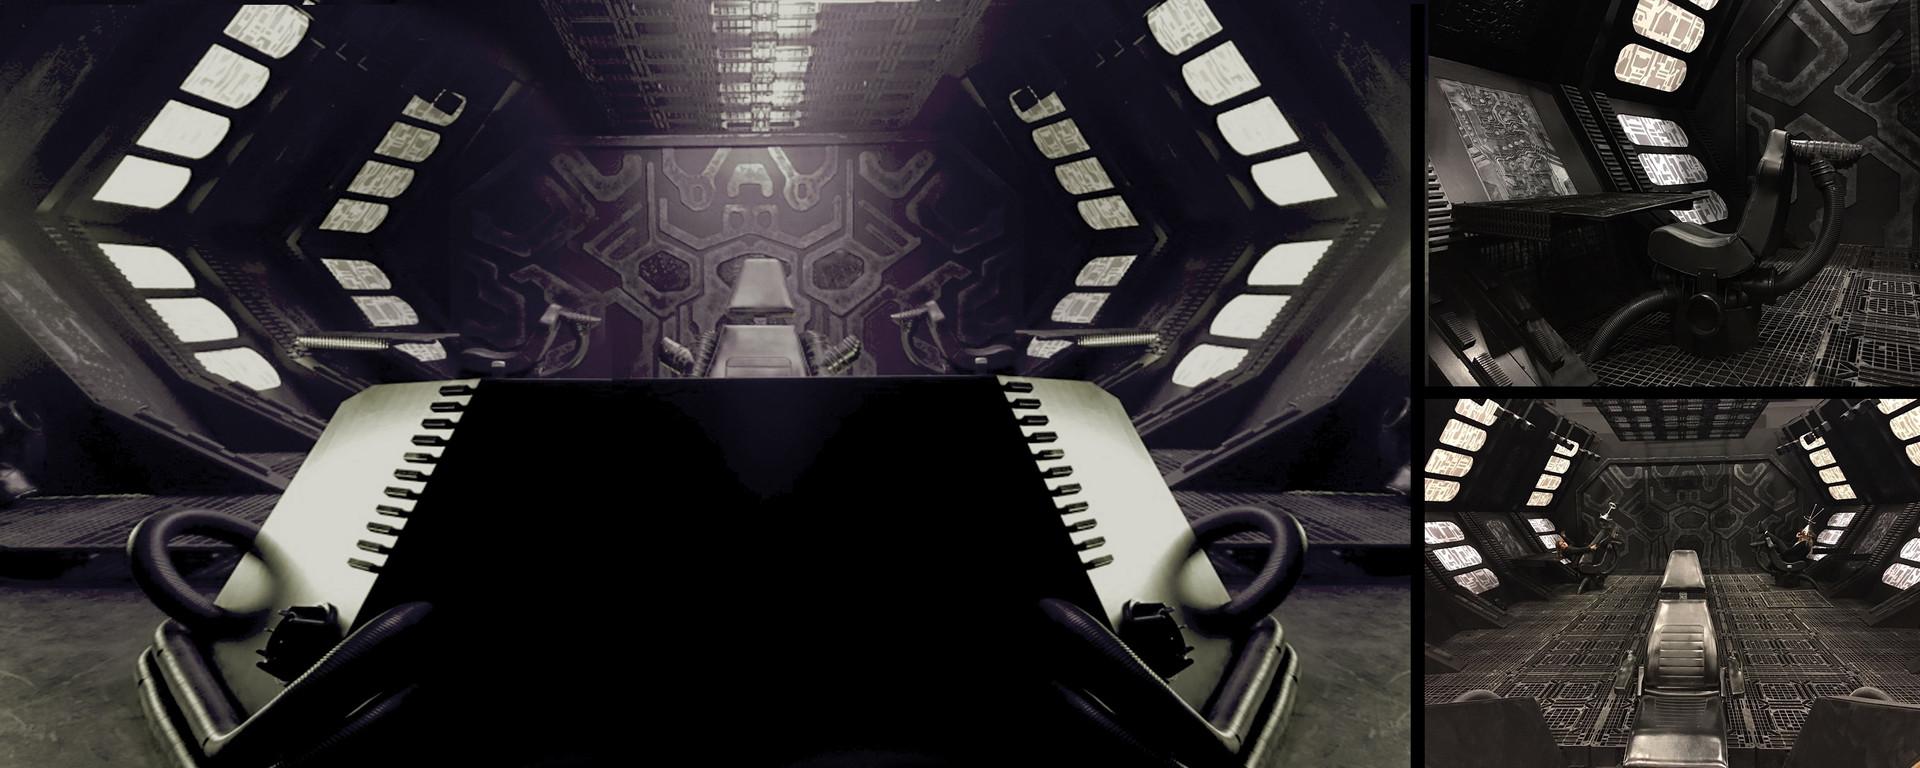 Set Build- Thinkbox Alien